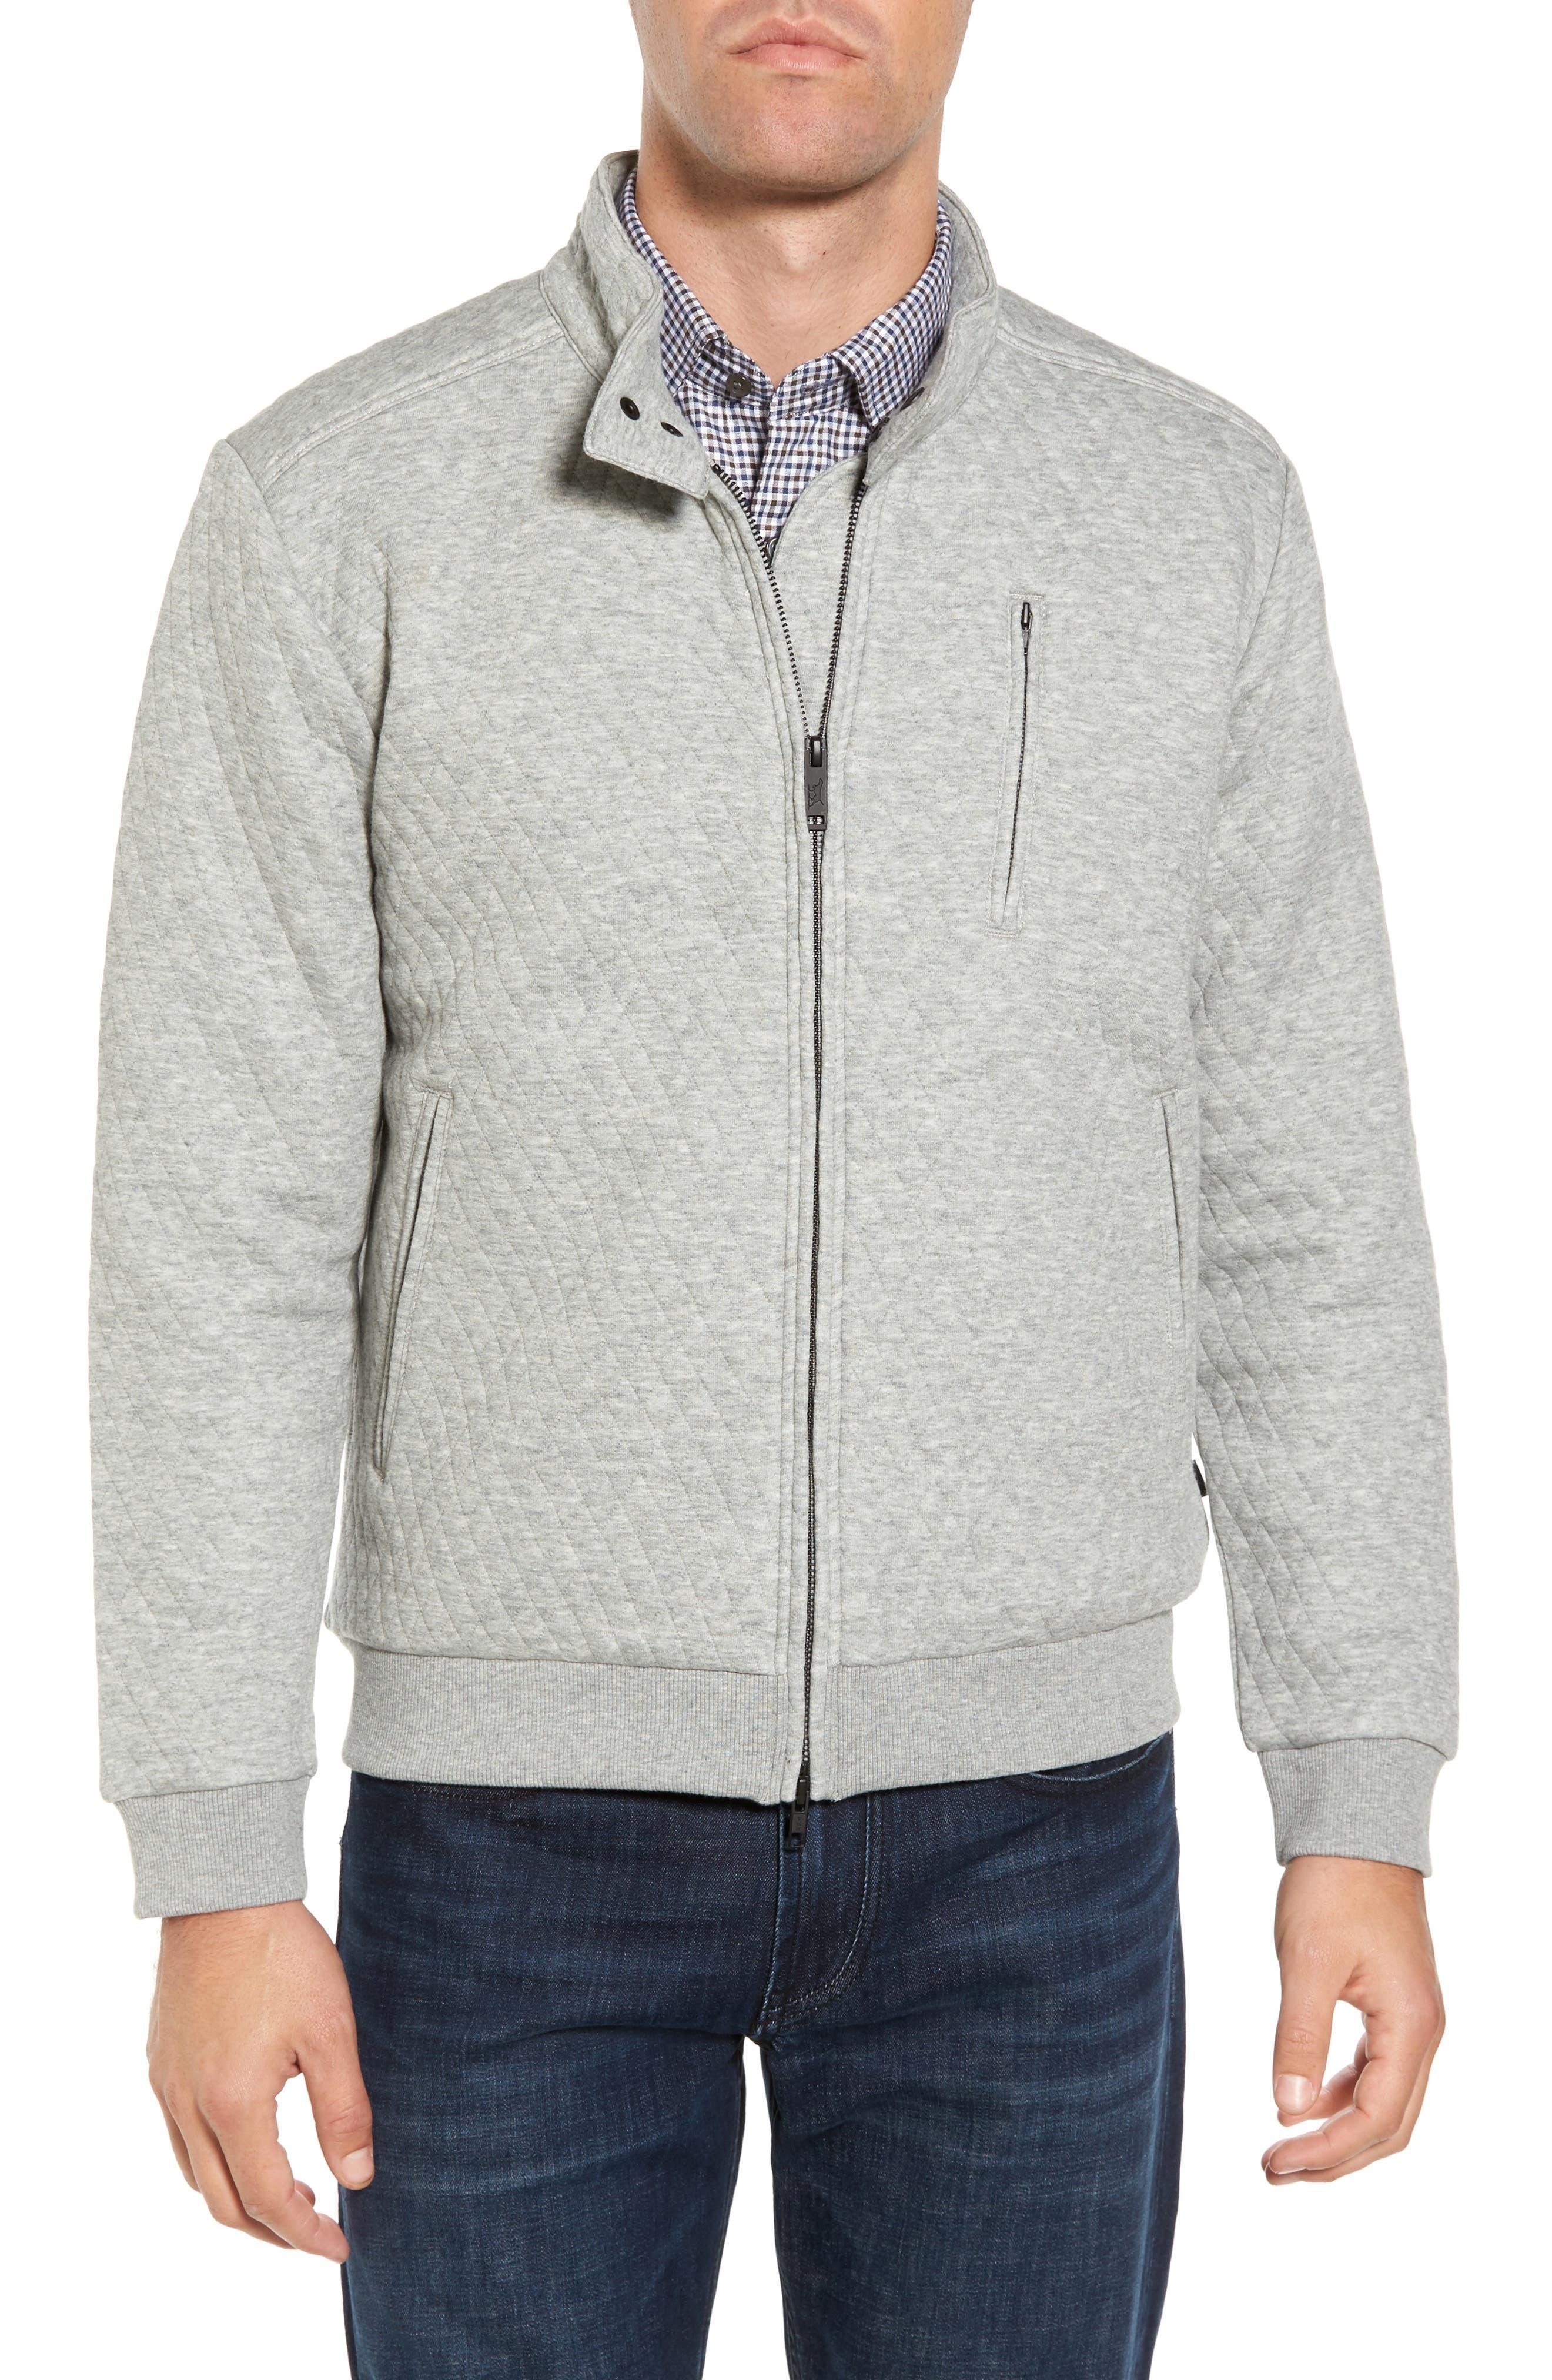 RODD & GUNN, Skipjack Pass Quilted Fleece Jacket, Main thumbnail 1, color, ASH